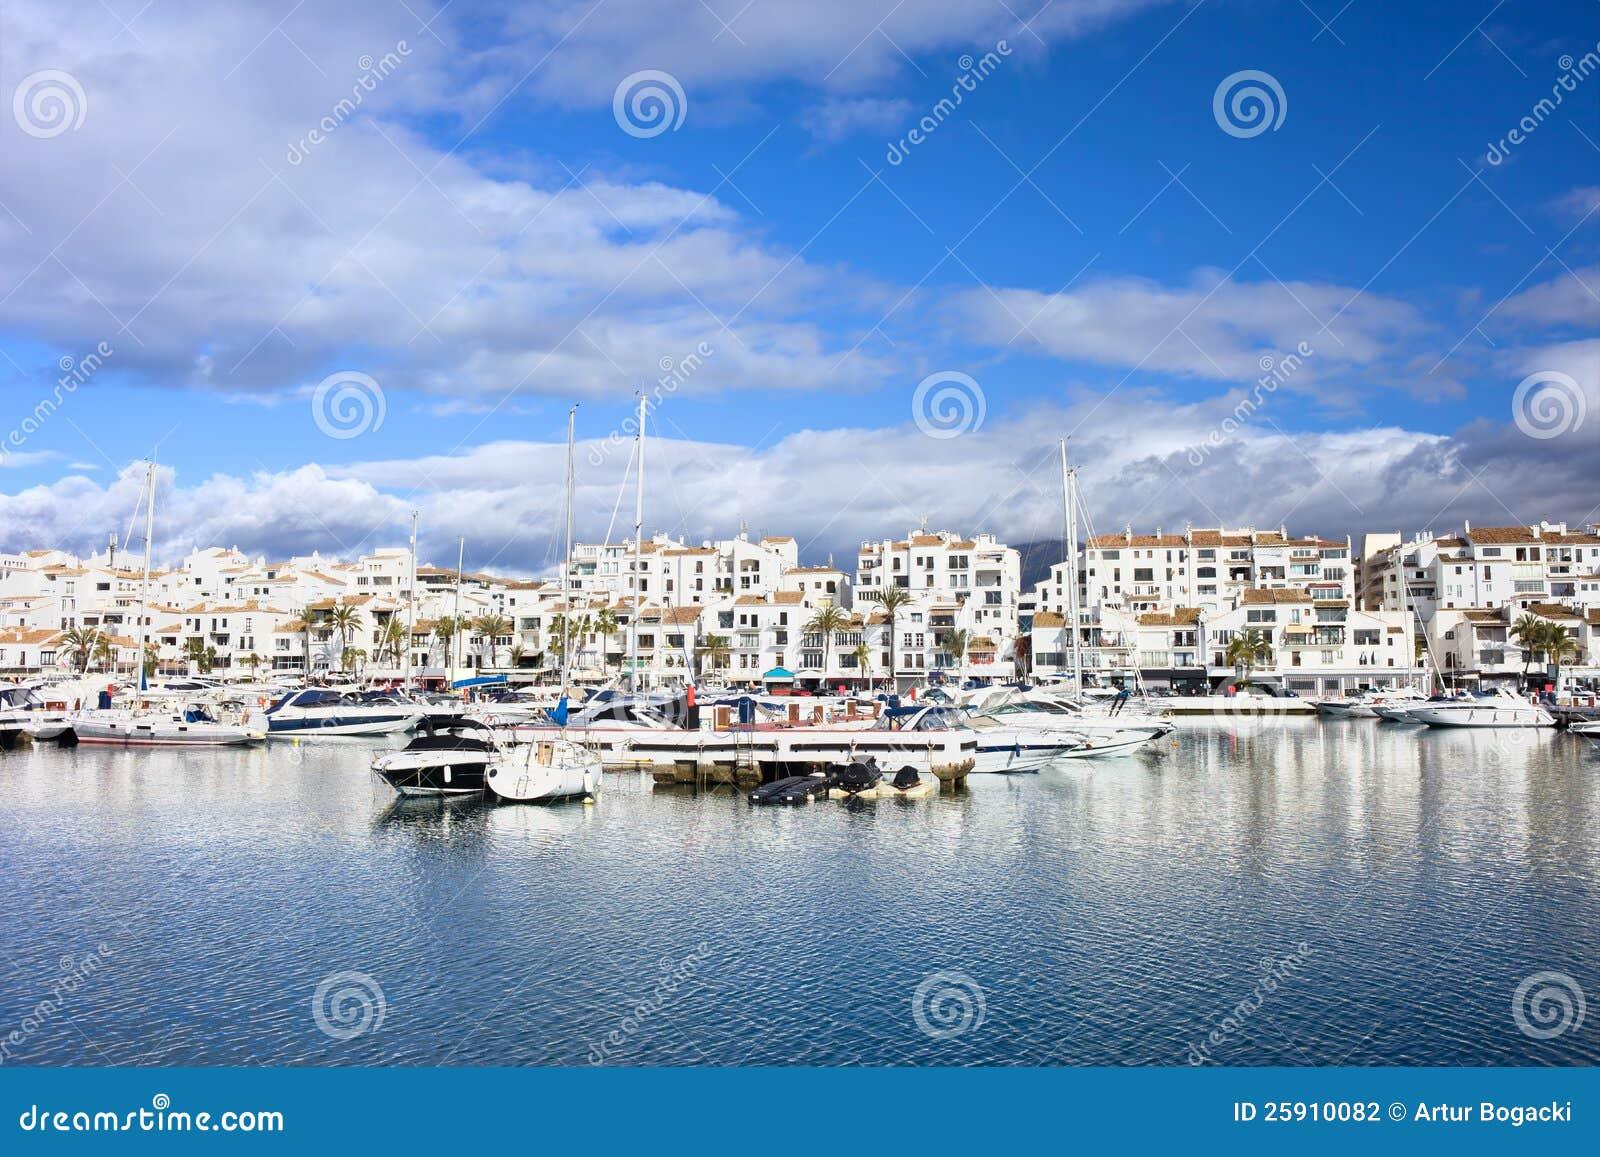 Puerto Banus Marina On Costa Del Sol Stock Photography